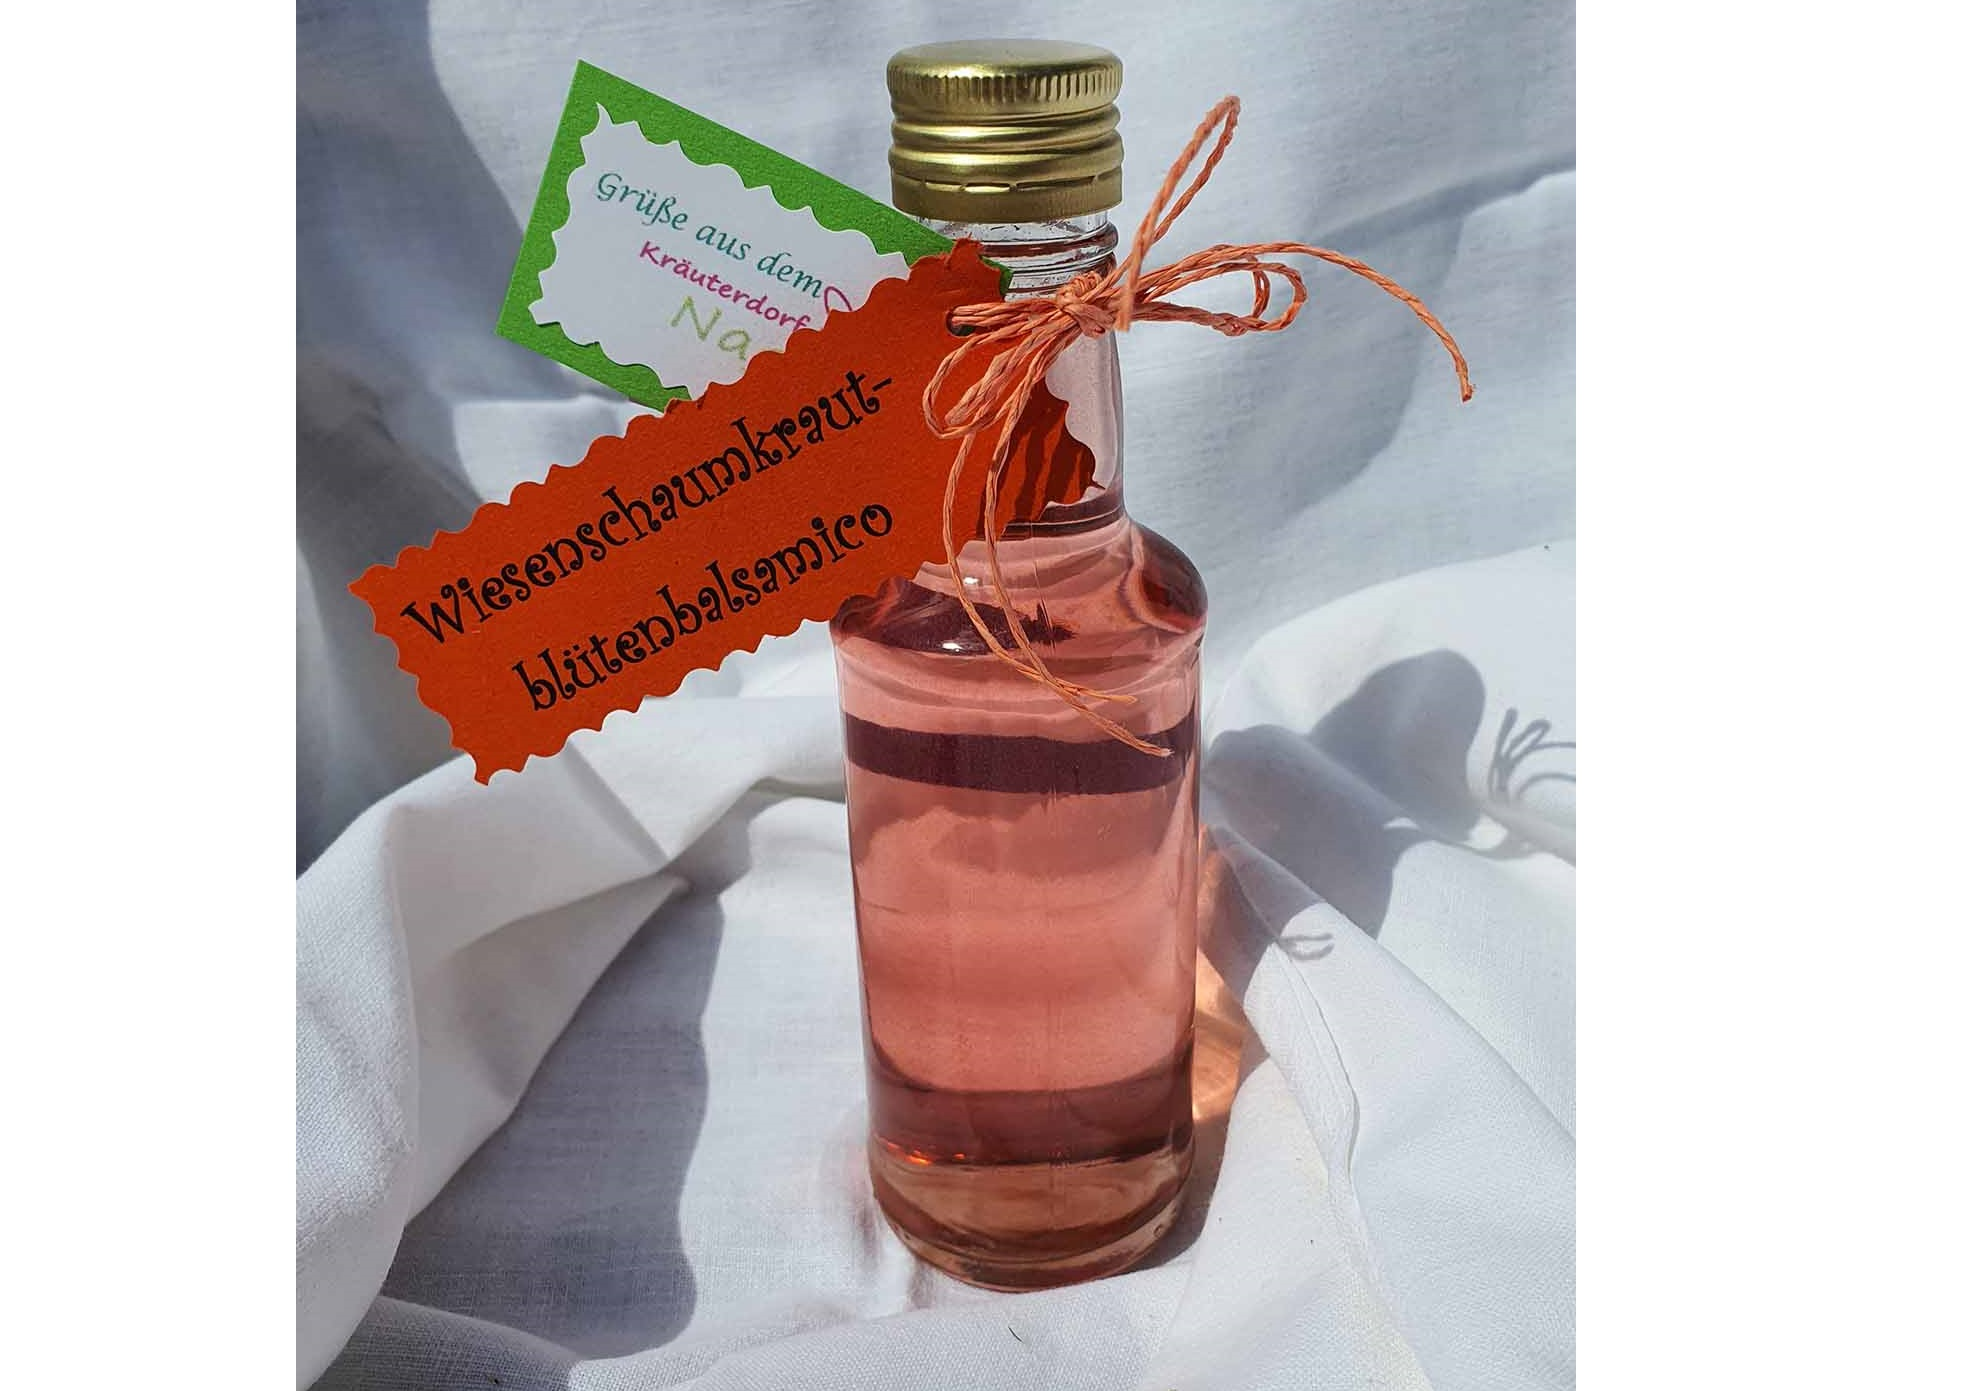 Wiesenschaumkrautblütenbalsamico aus dem Kräuterdorf Nagel